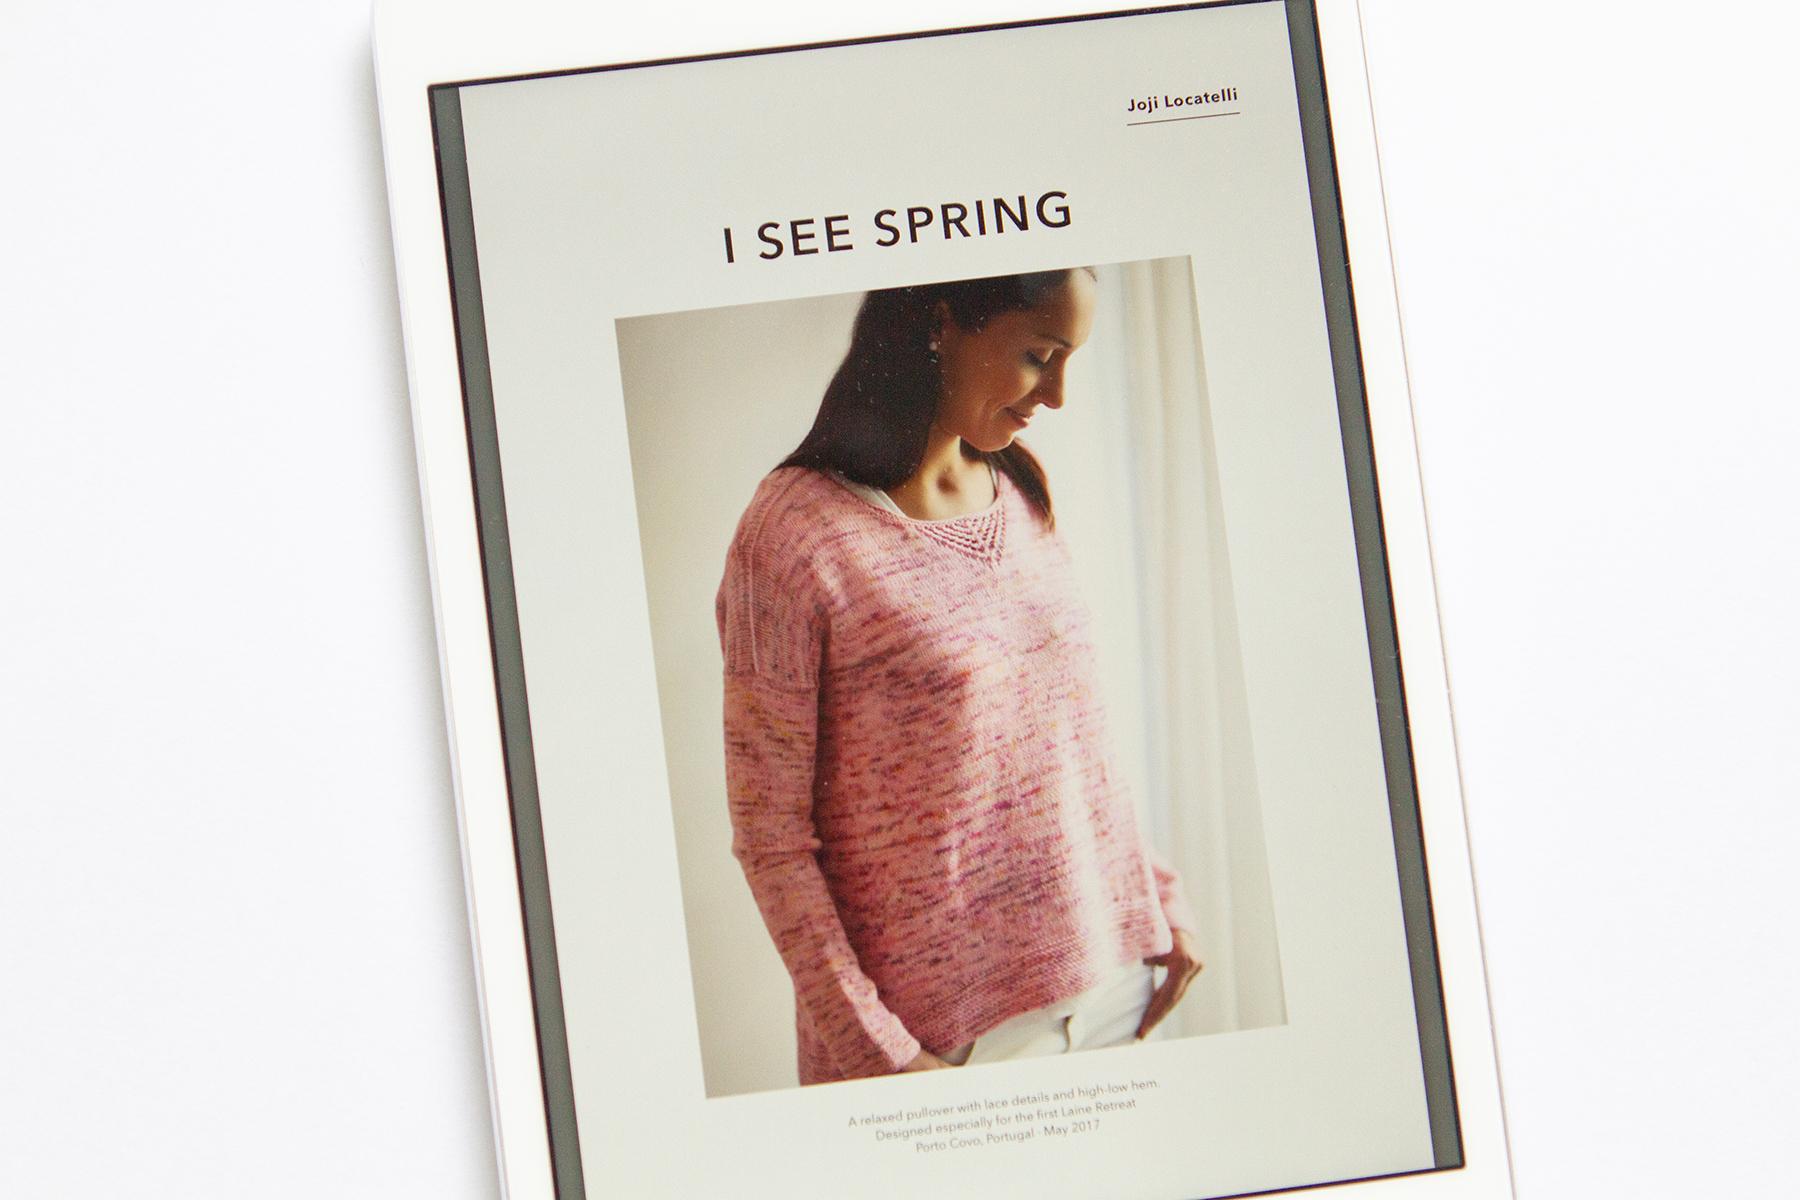 I See Spring by Joji Locatelli